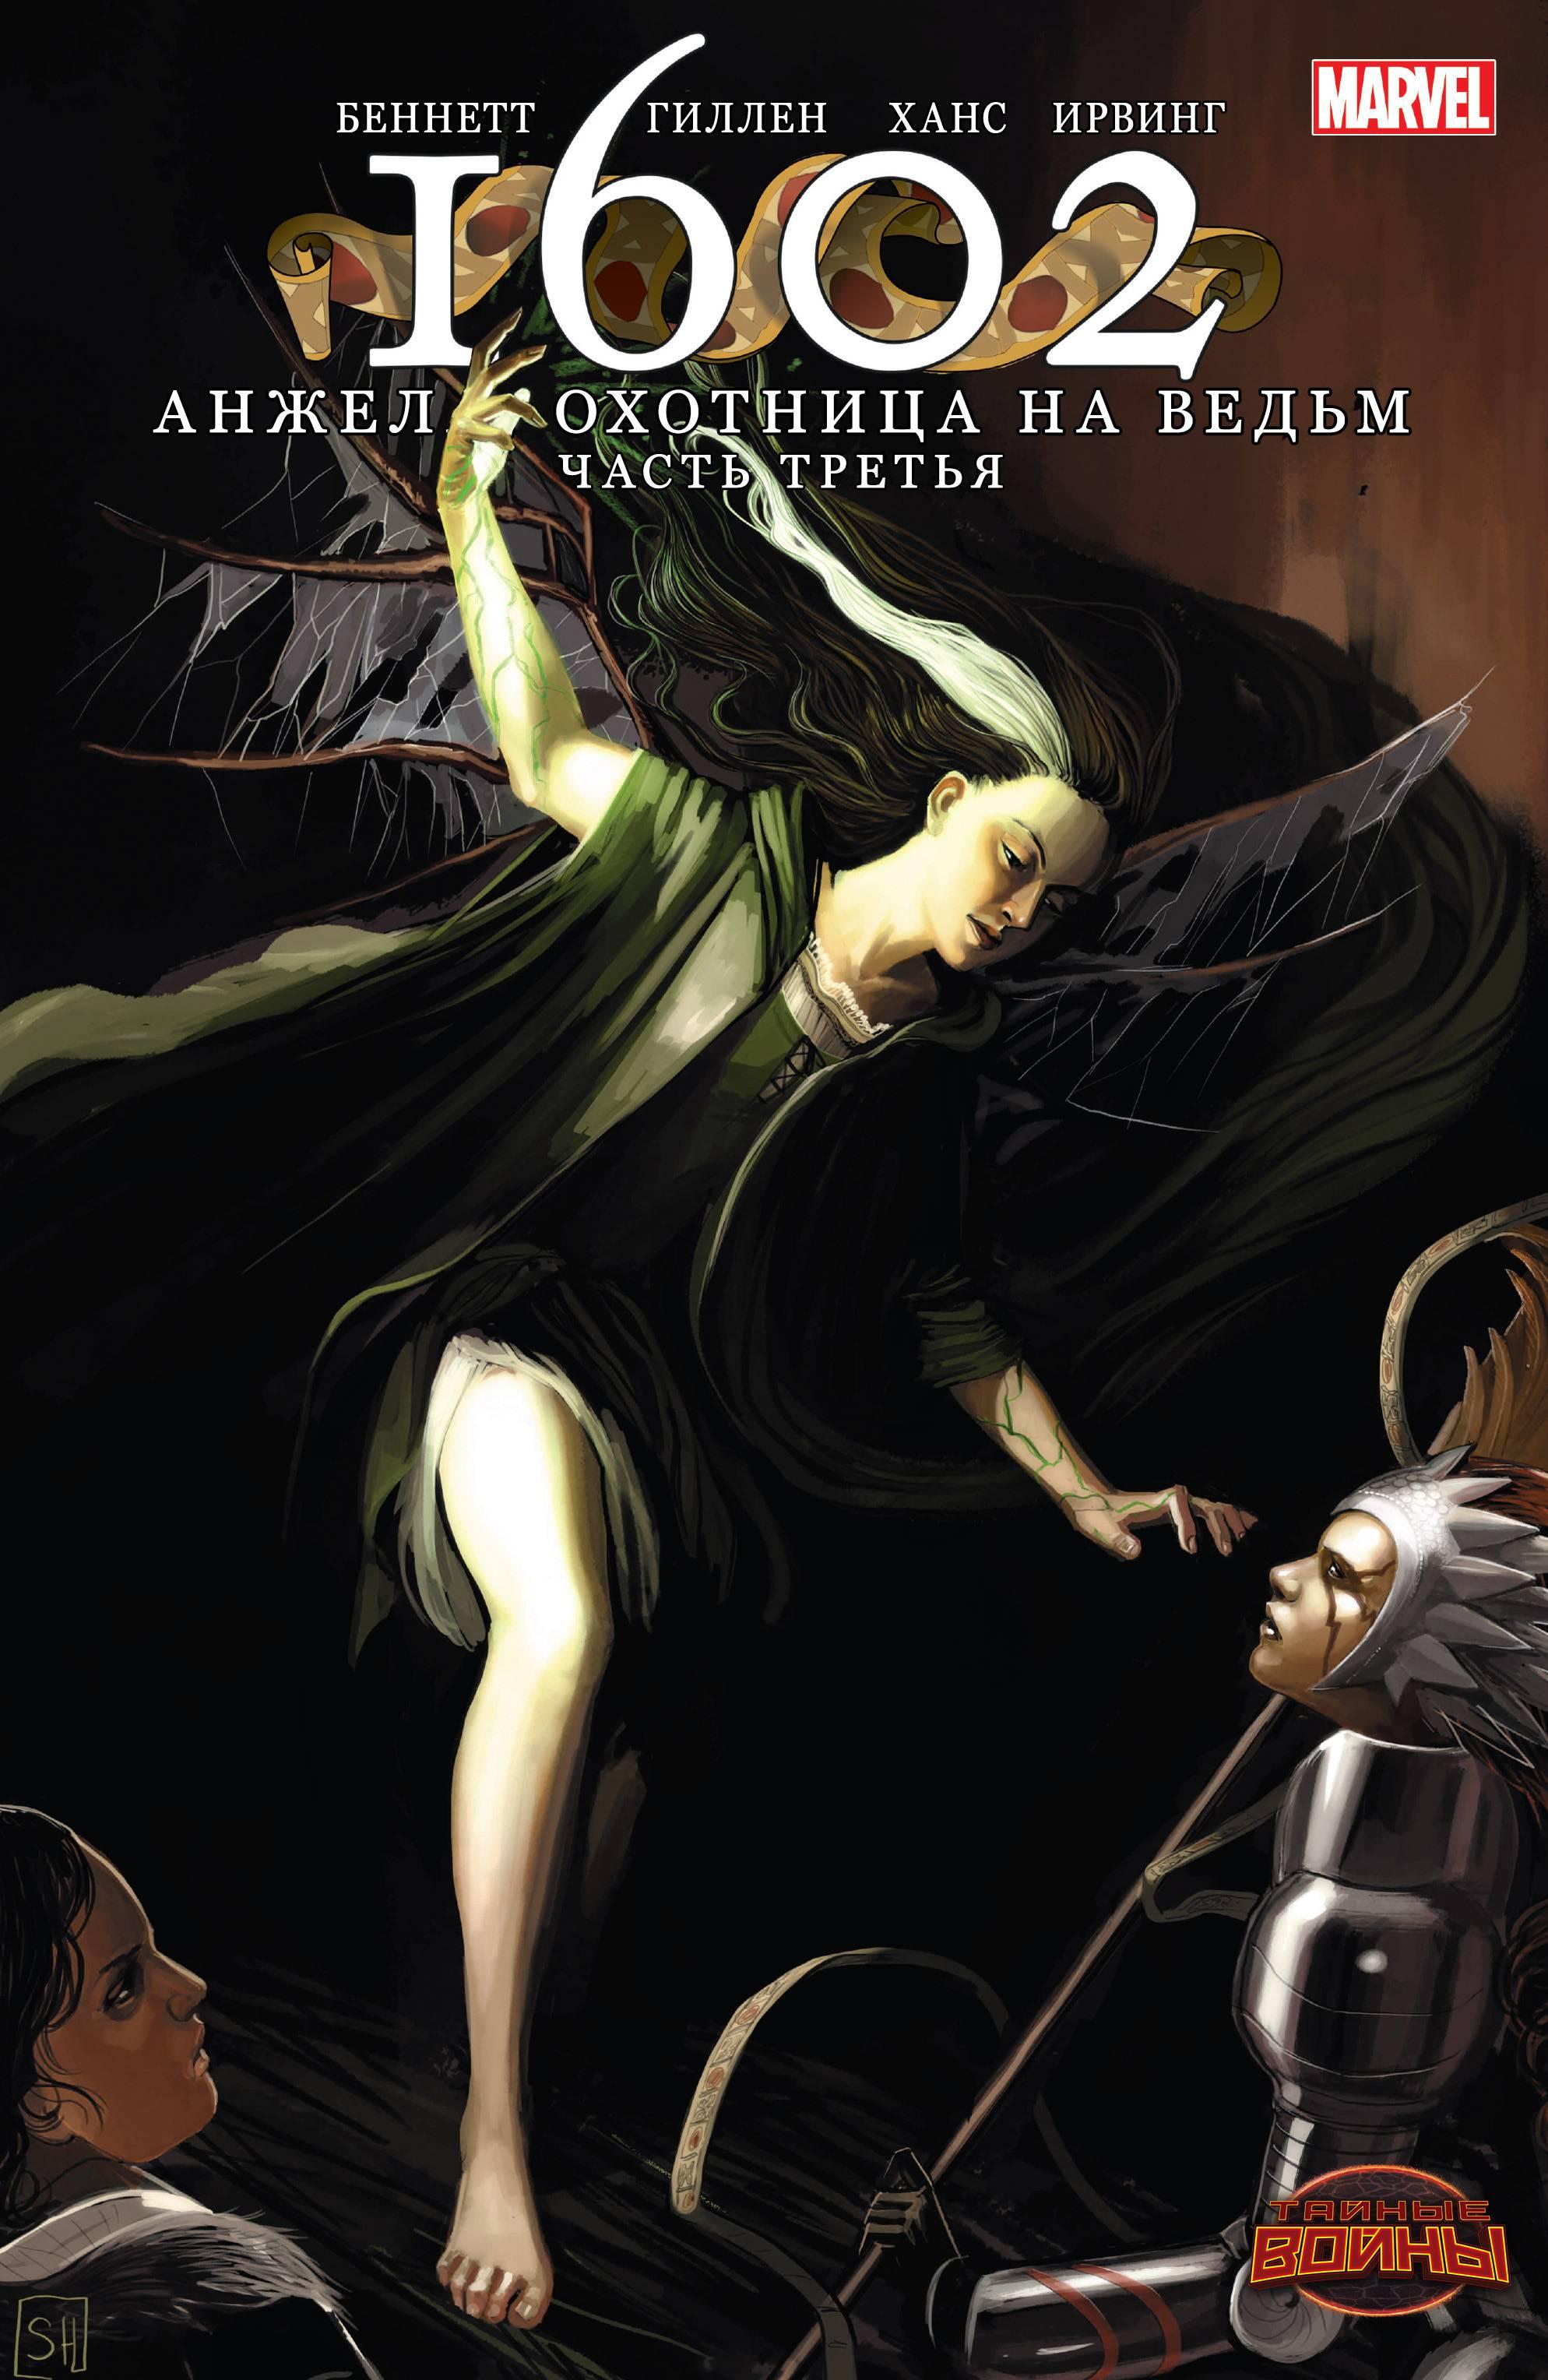 1602 Ангела, Охотница На Ведьм №3 онлайн